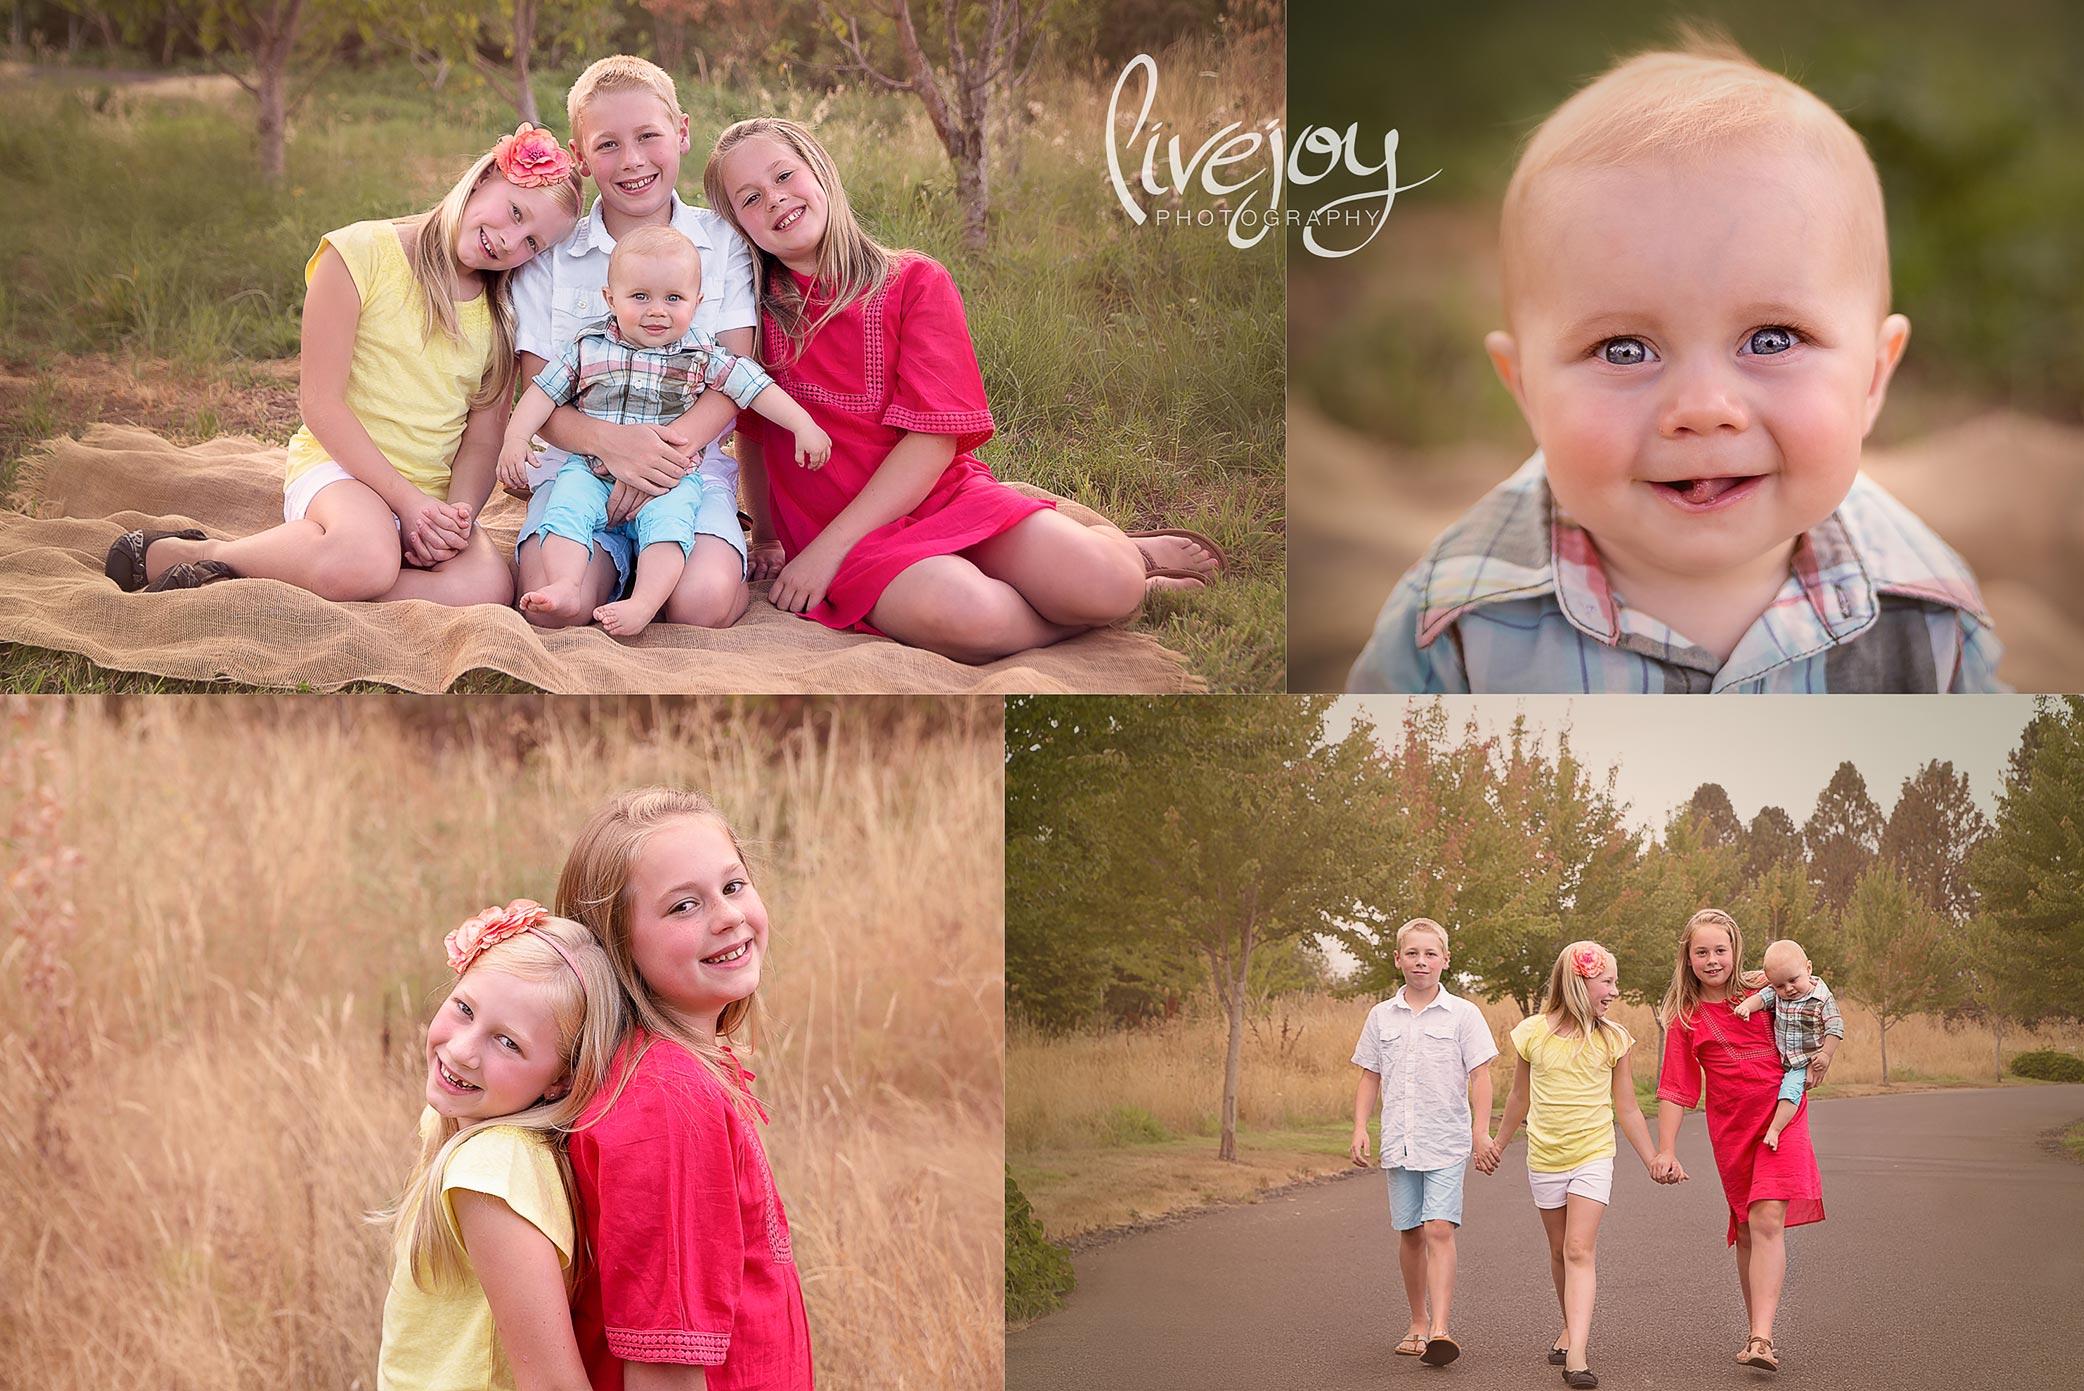 Family Photos | Salem, Oregon | LiveJoy Photography